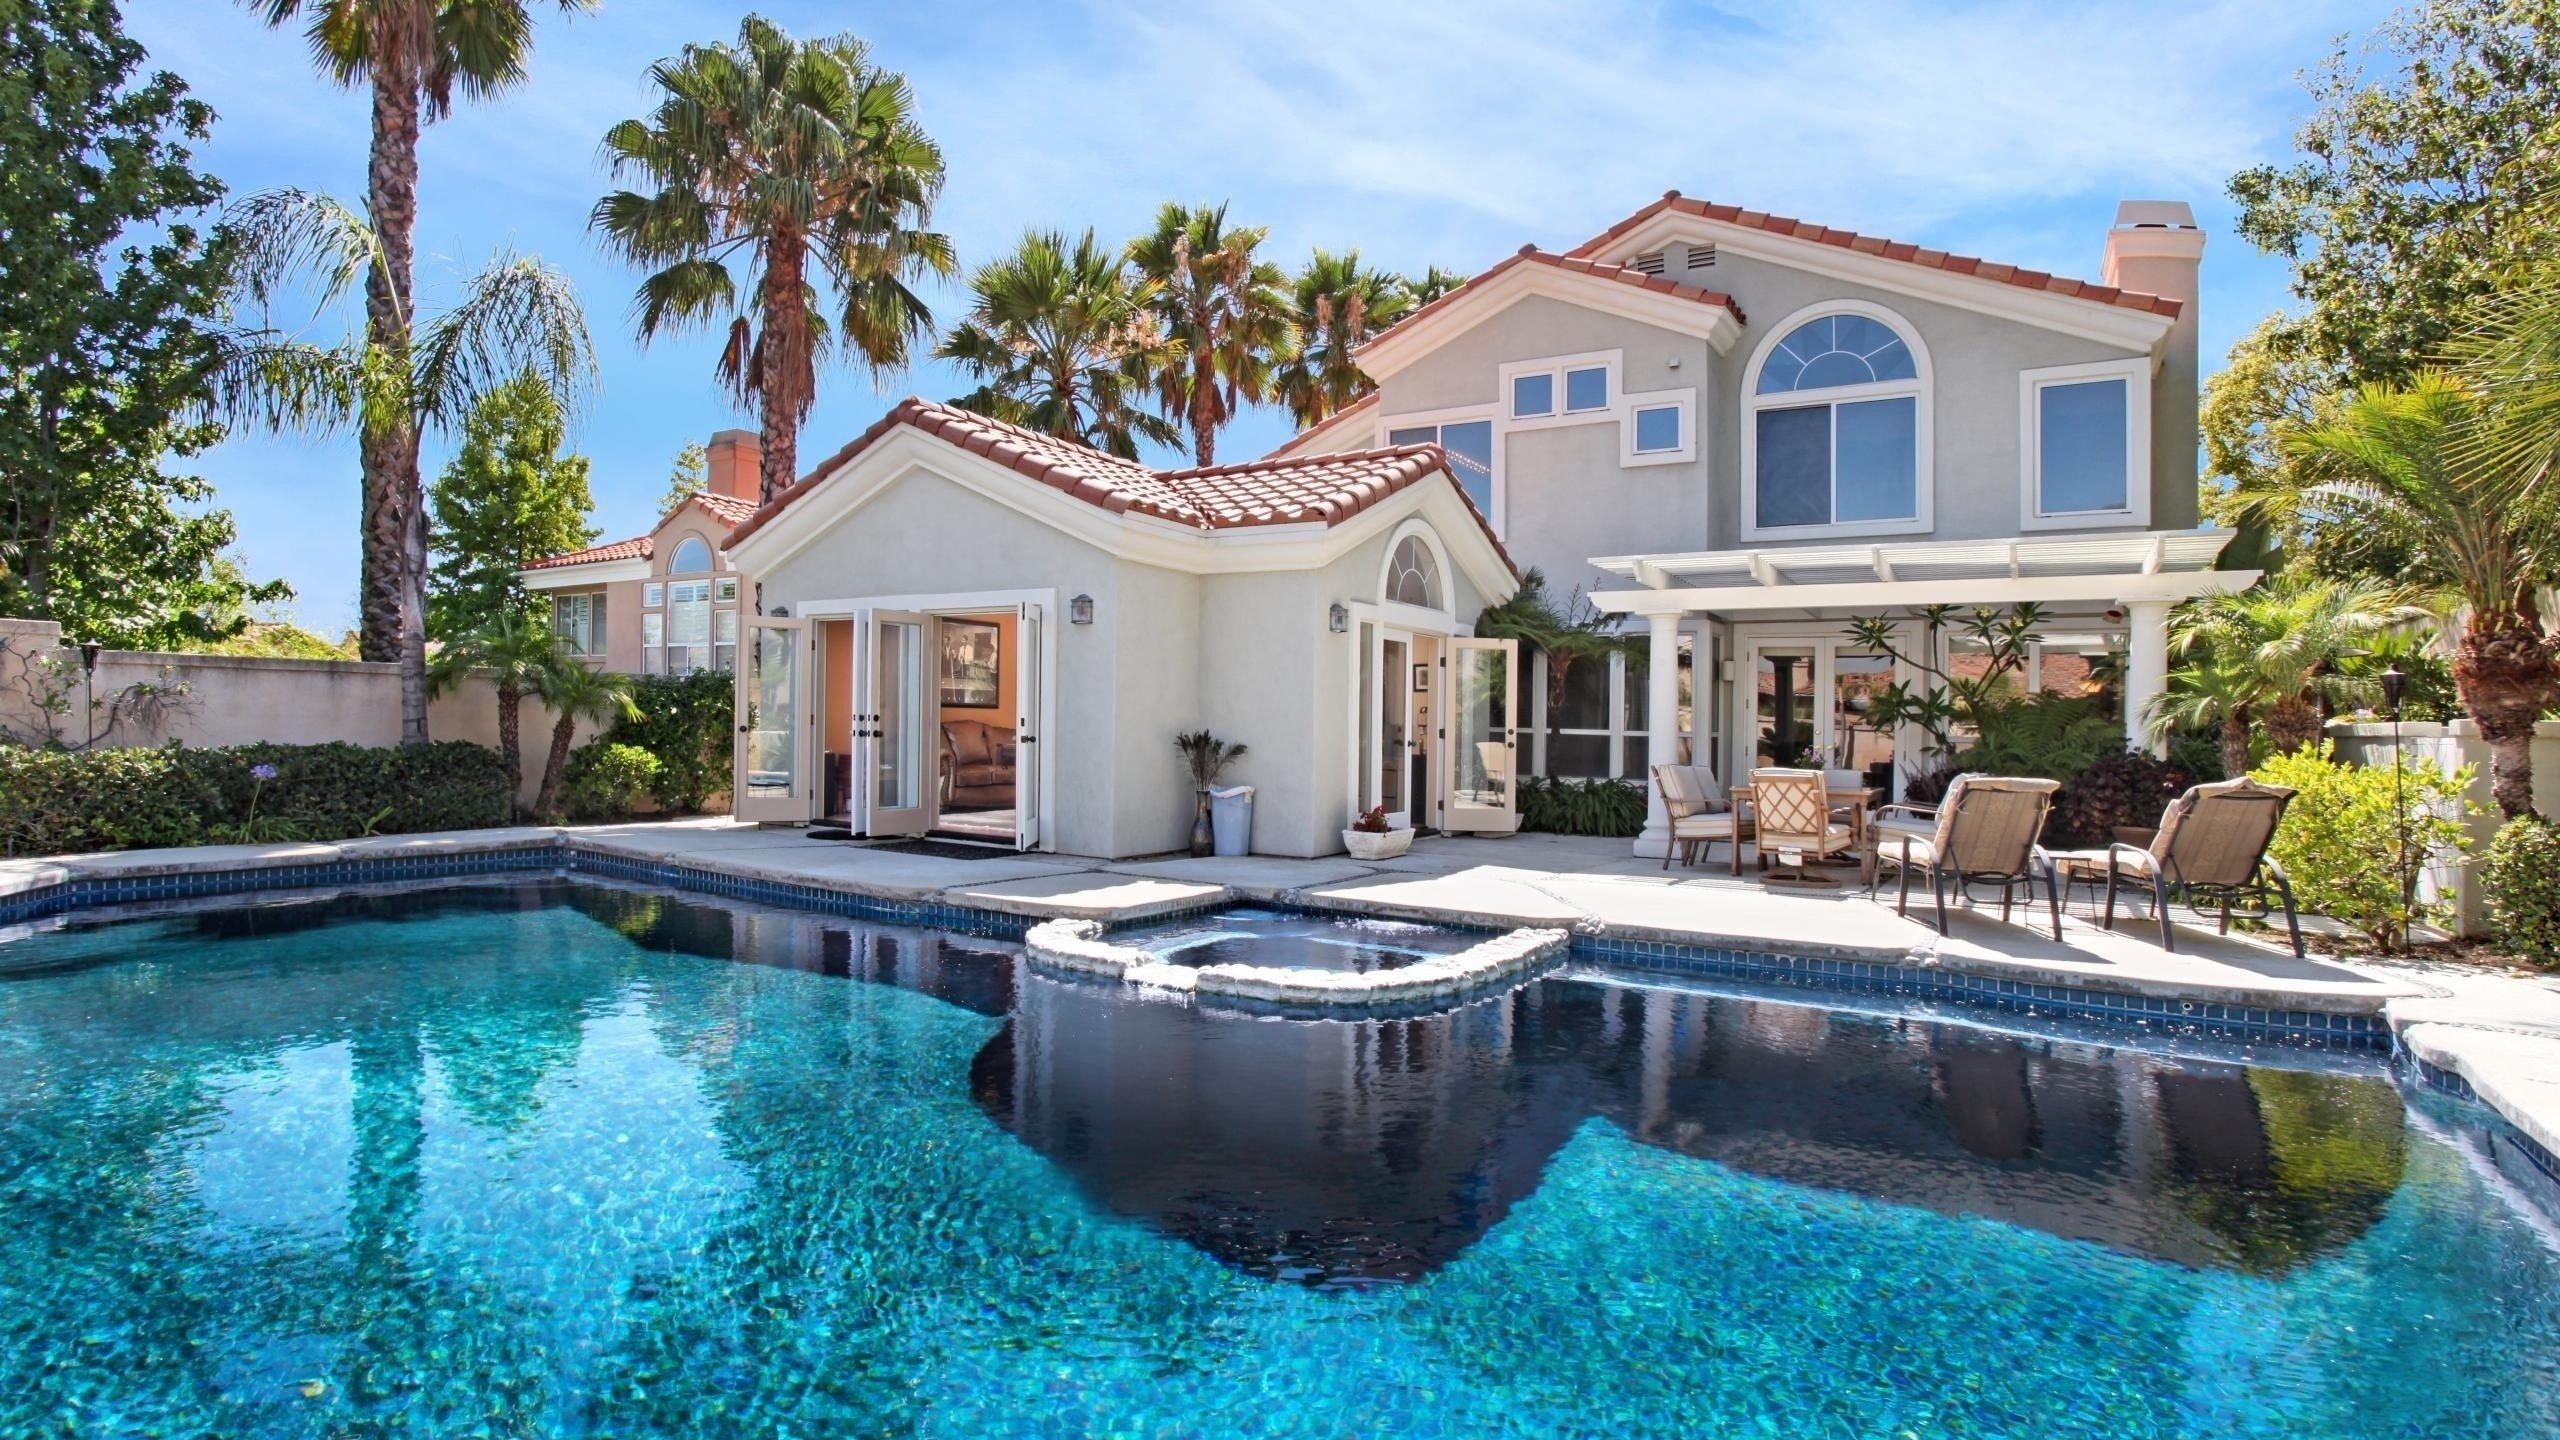 Покупка недвижимость за рубежом аренда квартир а дубай